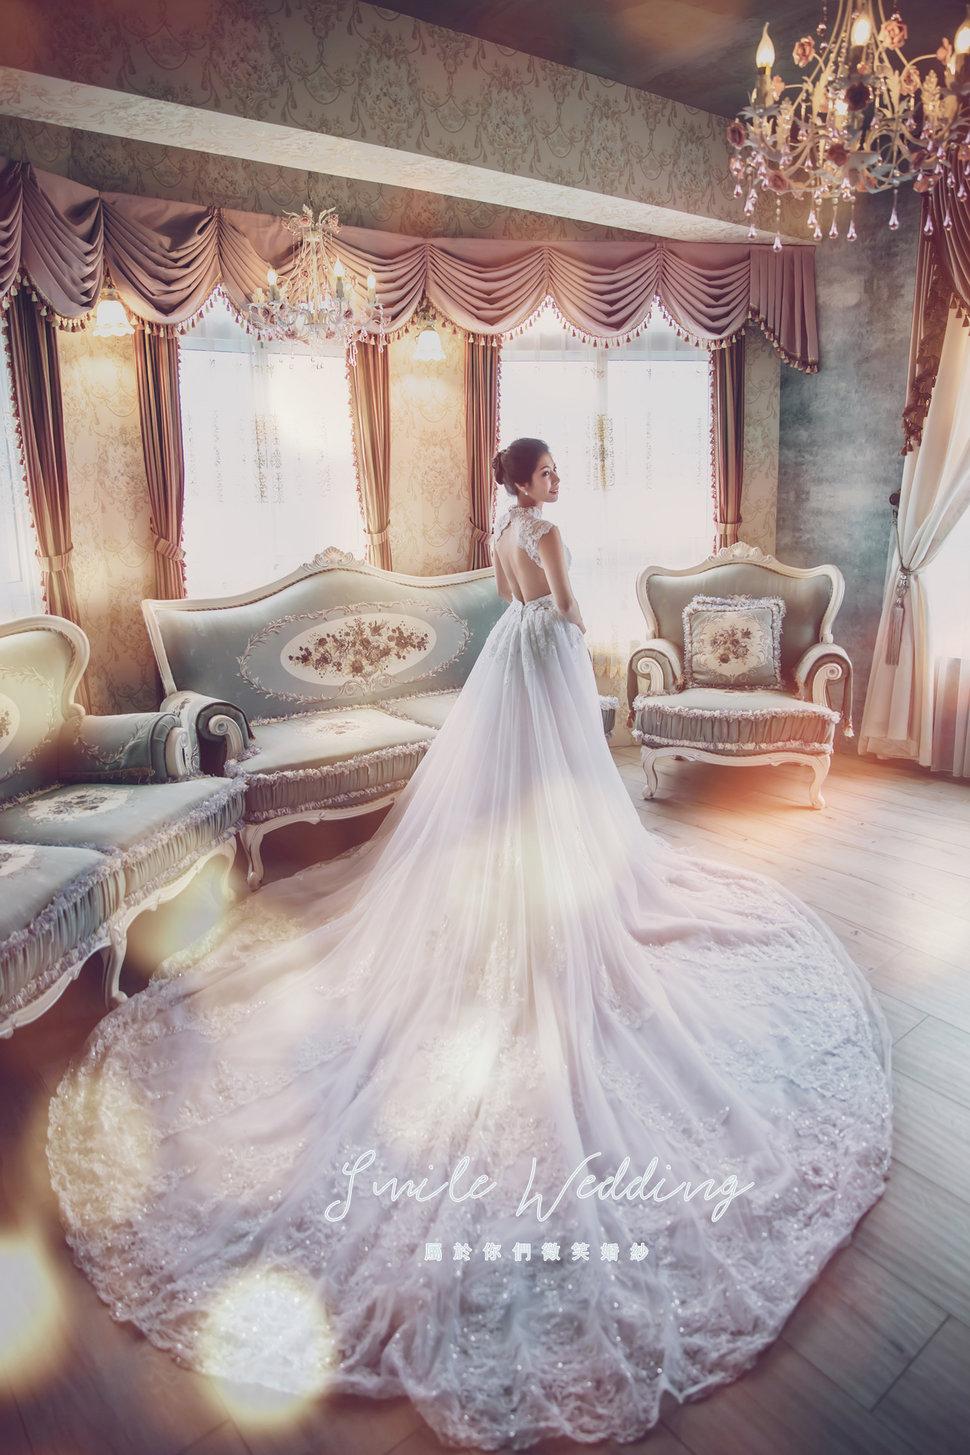 SIN_8482 - Smile wedding 微笑婚紗《結婚吧》